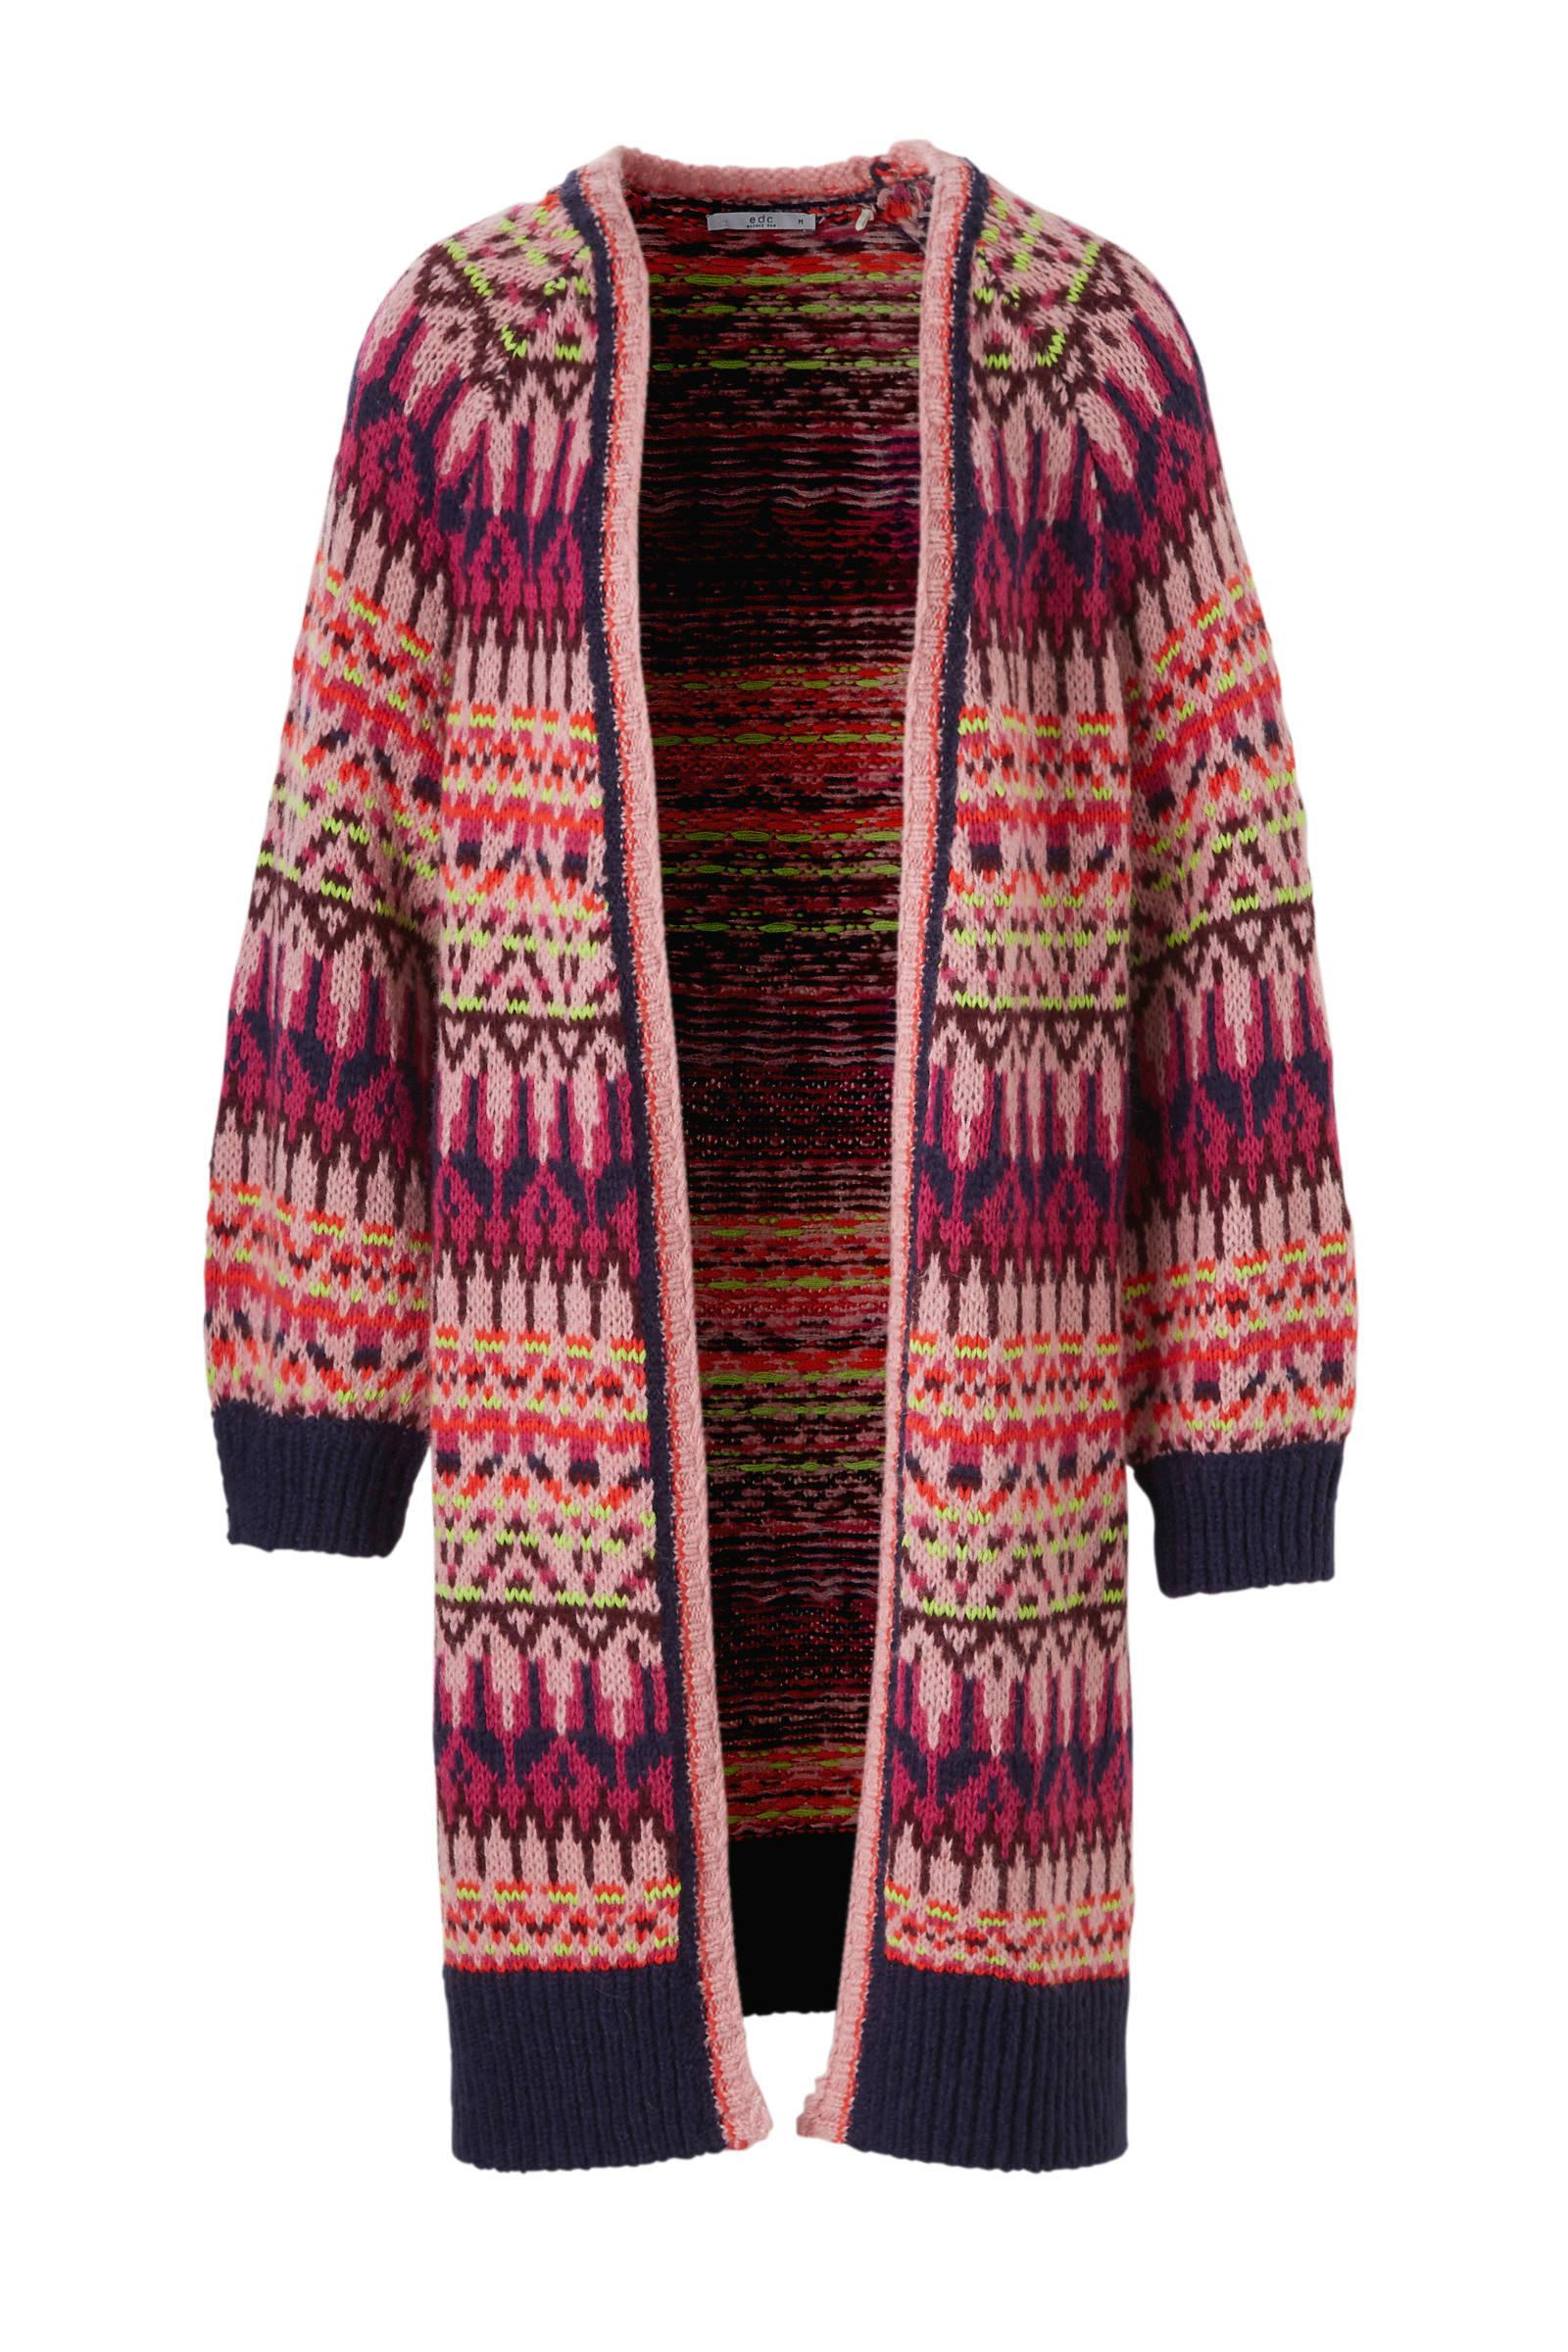 9904ef67ea0a4c edc-women-lang-vest-met-print-roze-4061354867042.jpg